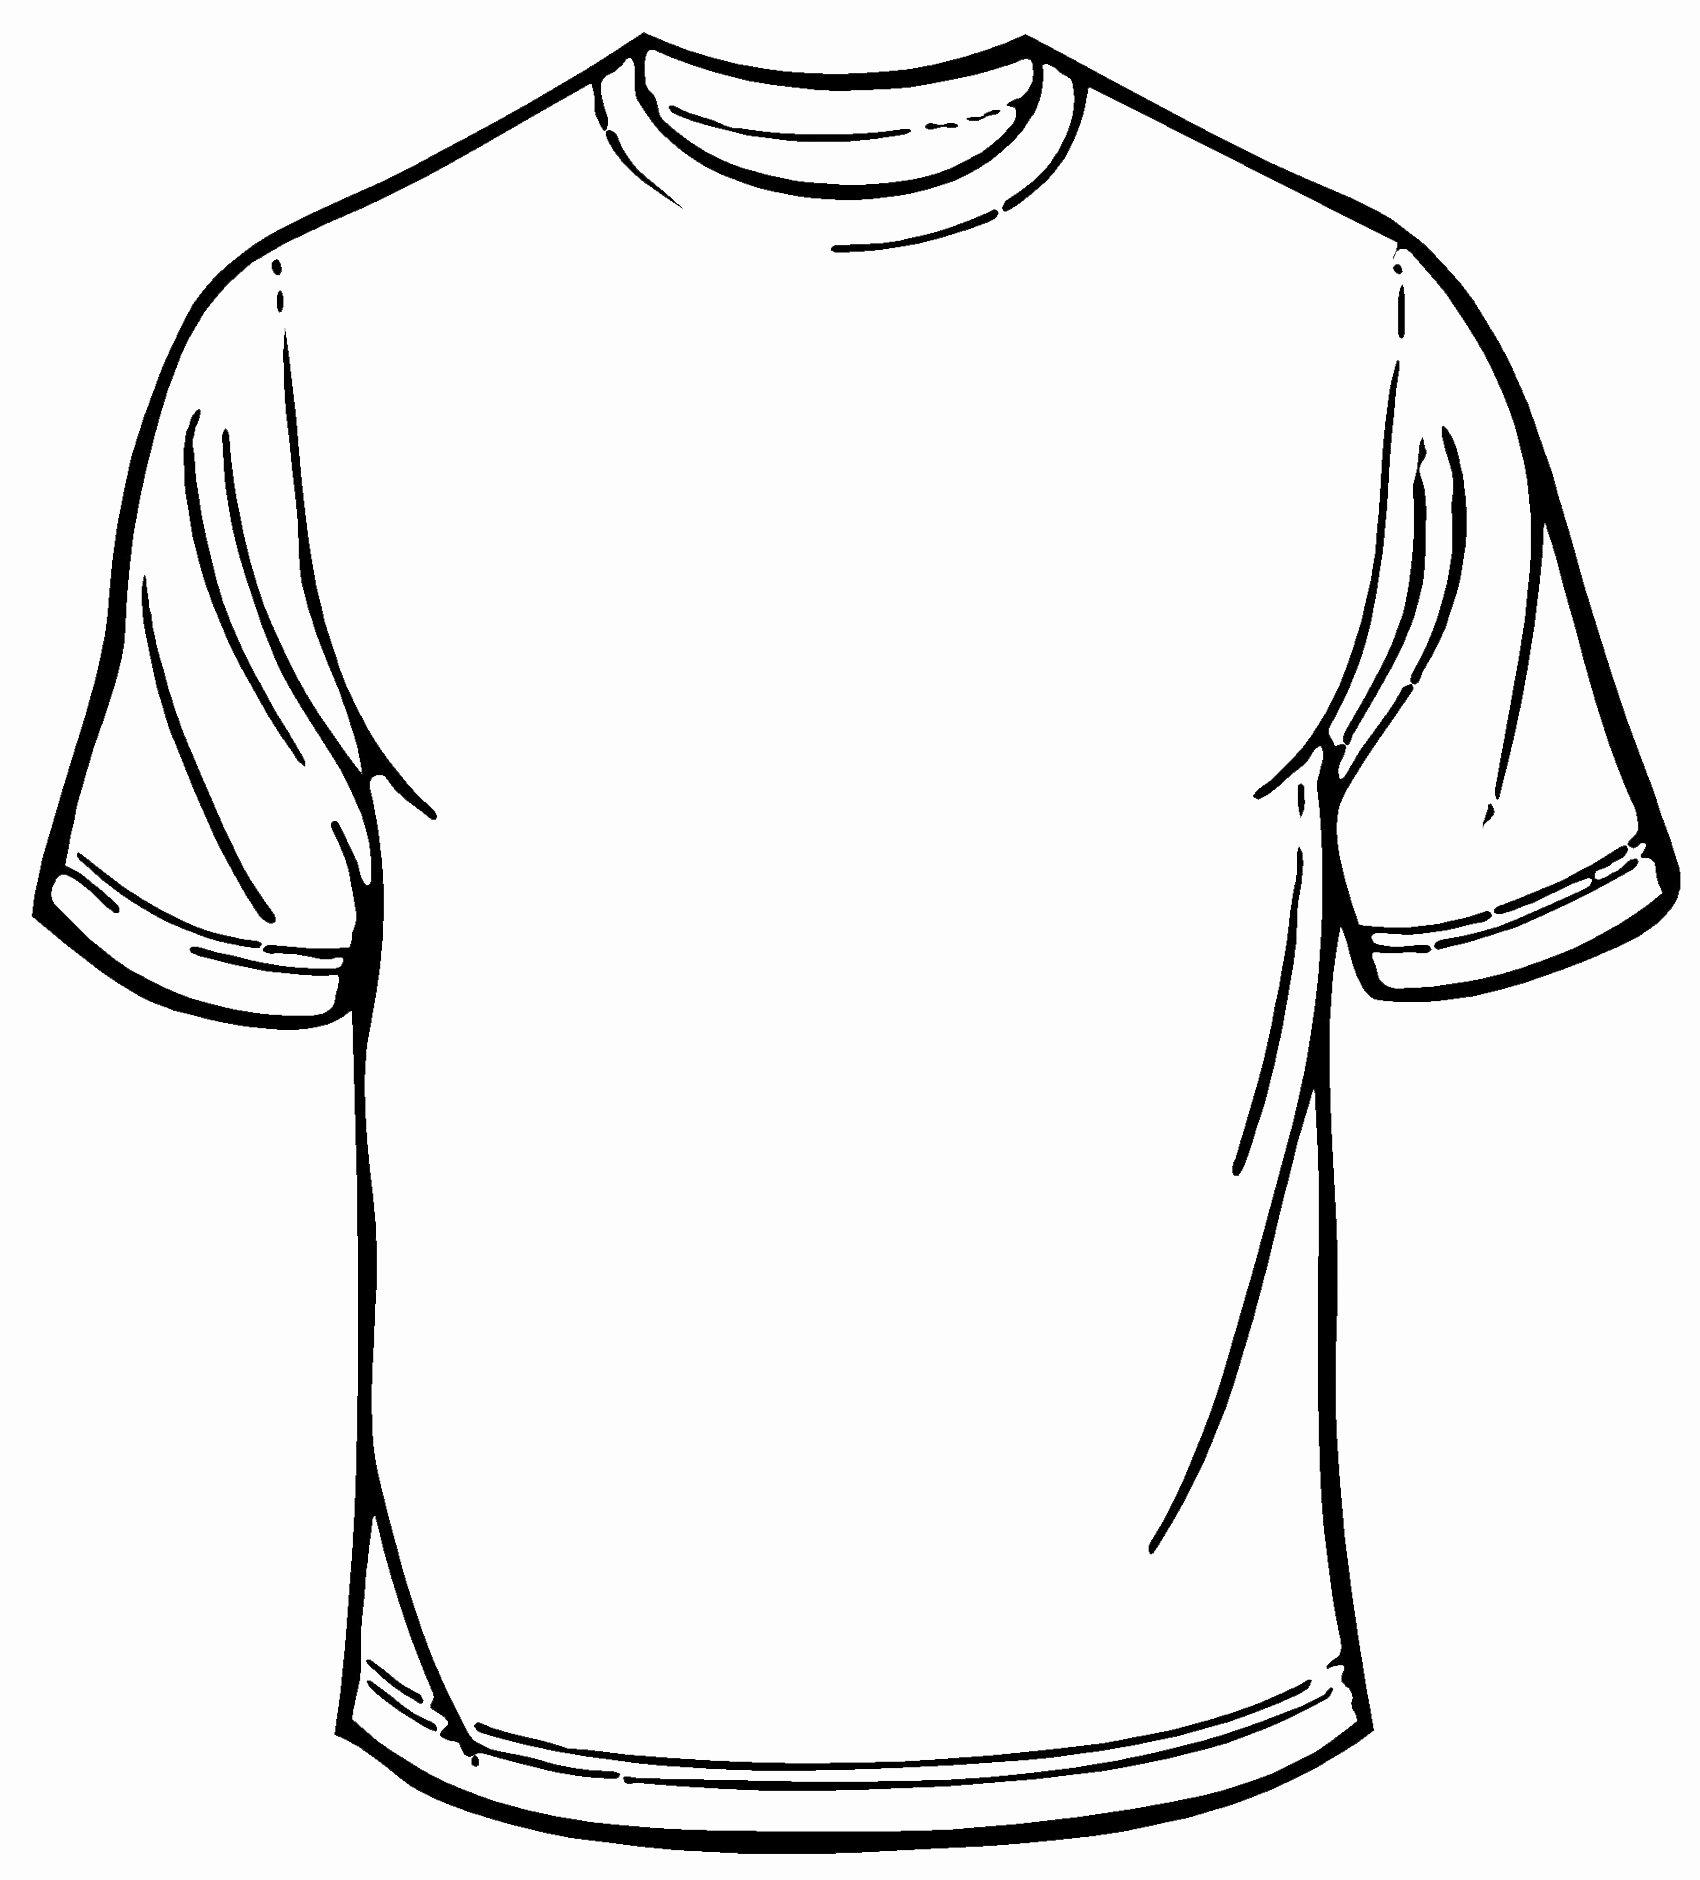 Blank Tshirt Template Beautiful Blank T Shirt Template